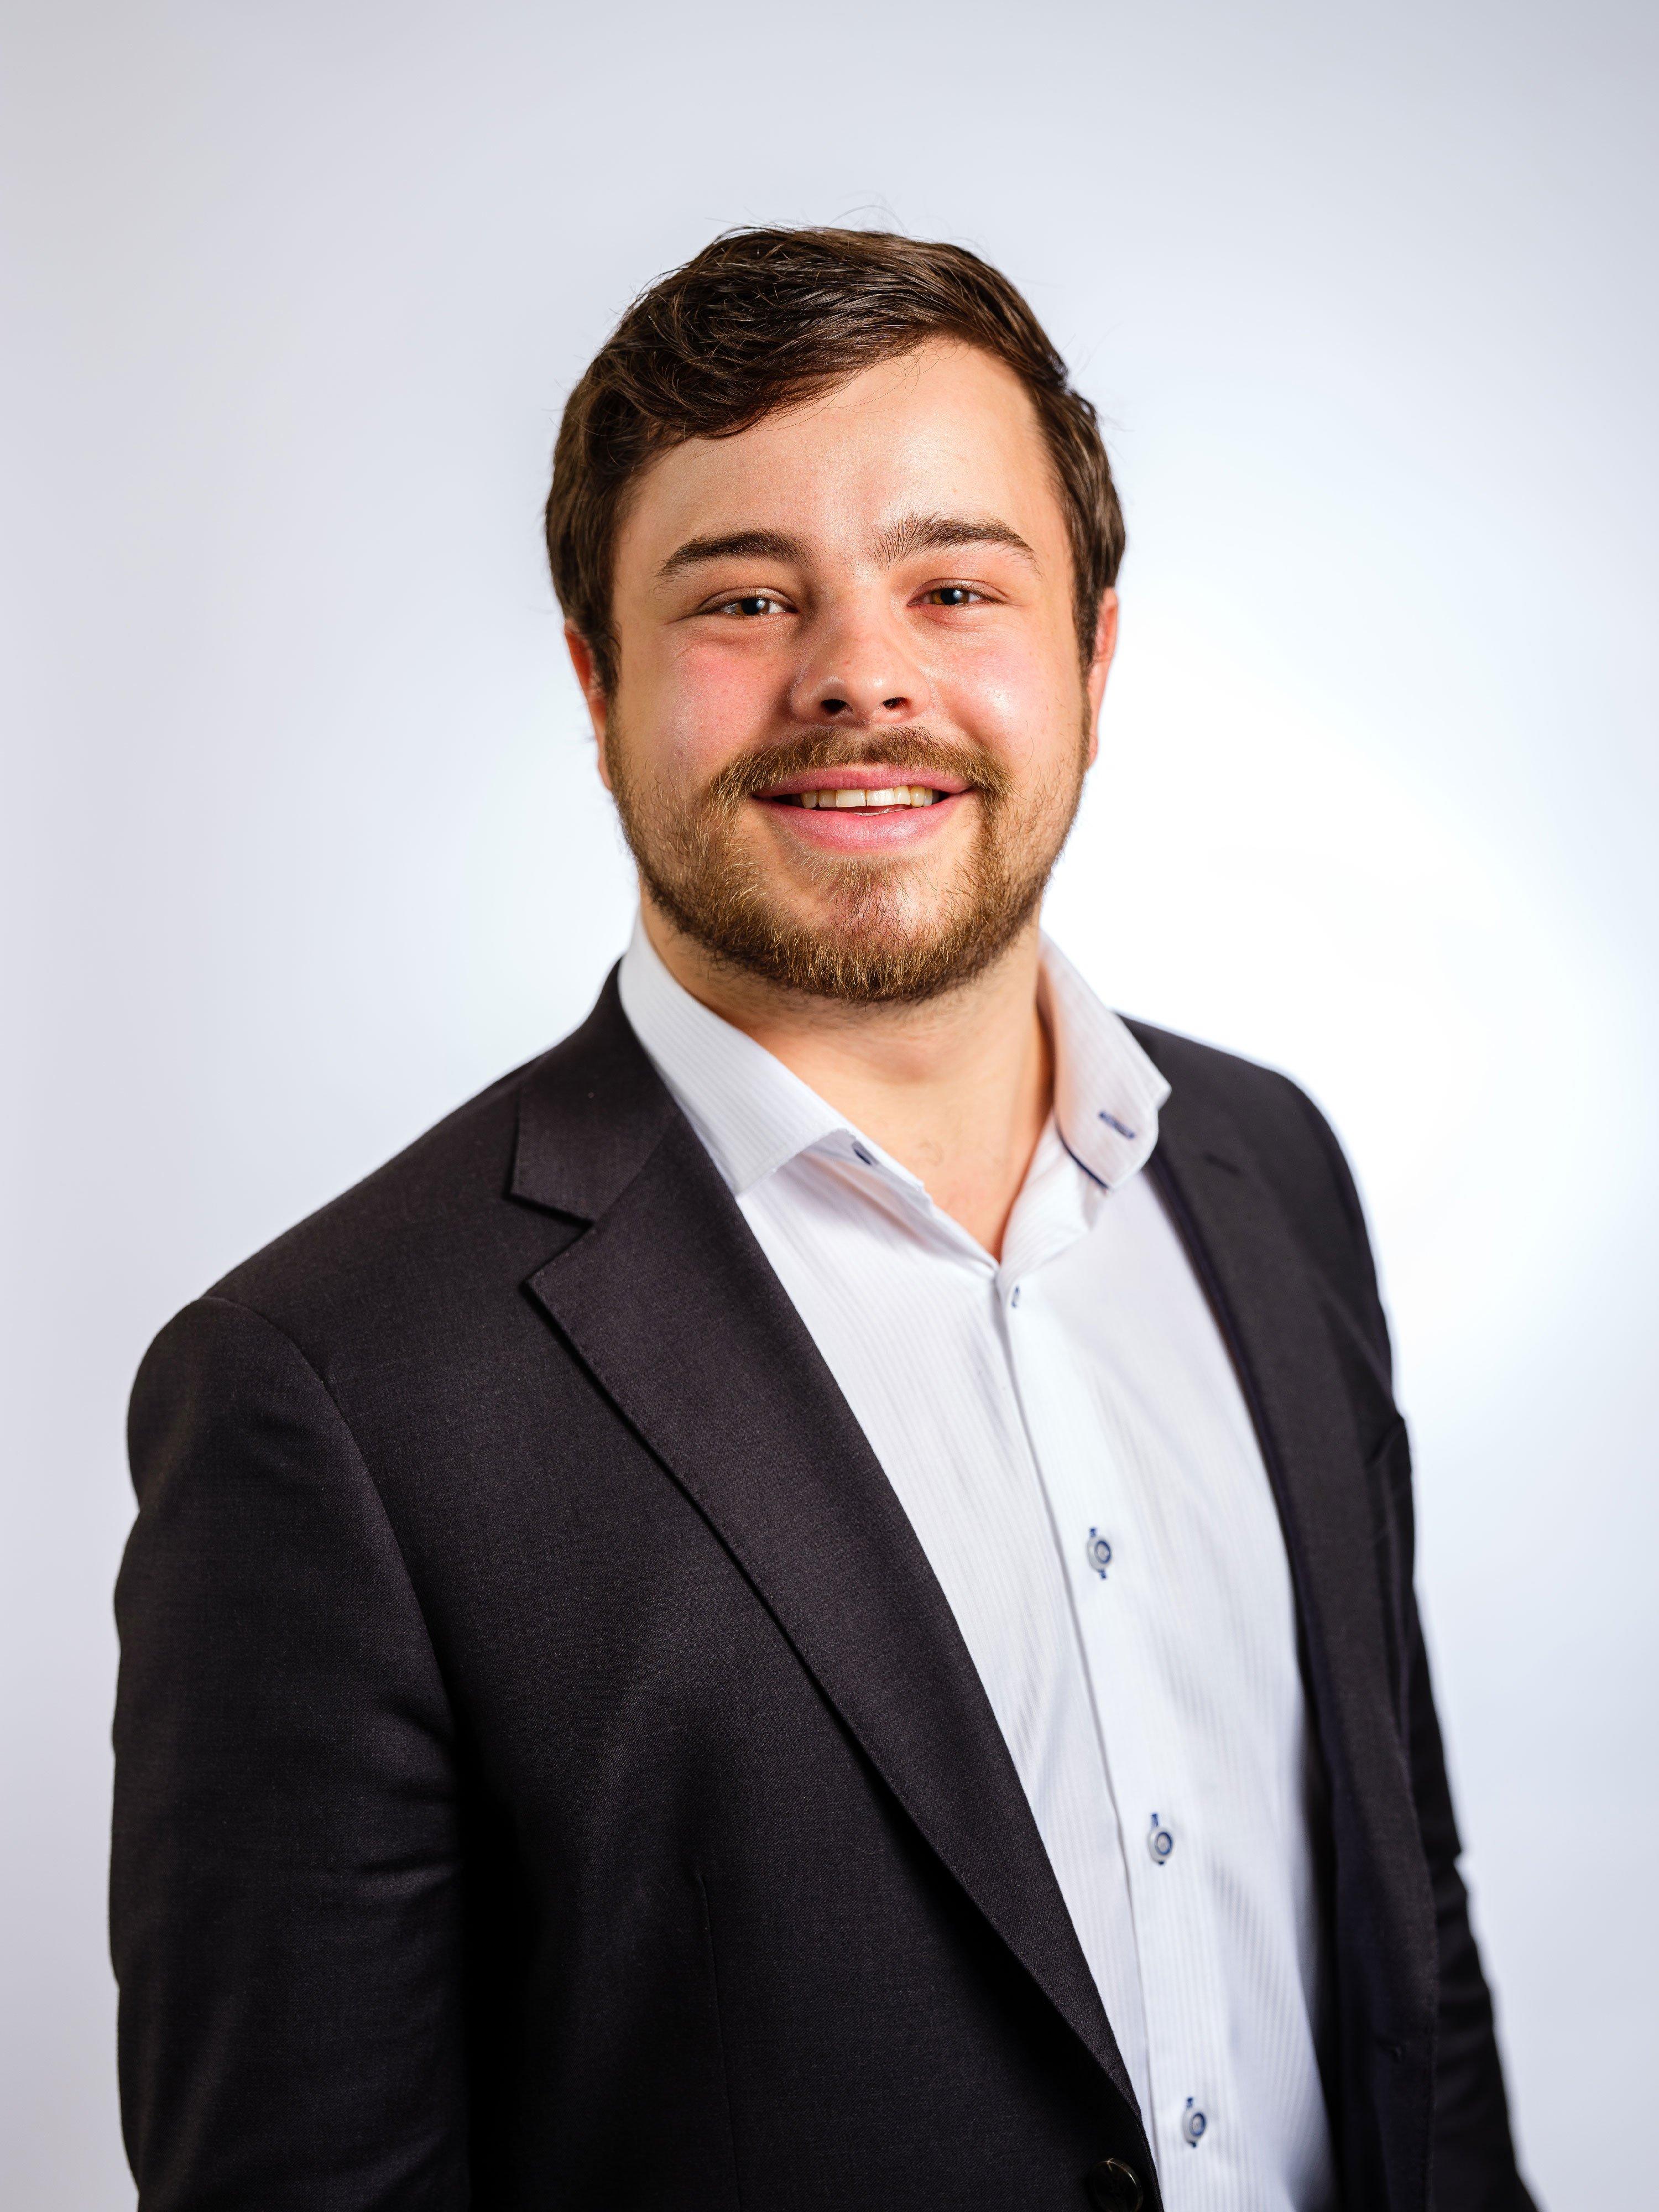 Josh Trlin Profile photo 2019